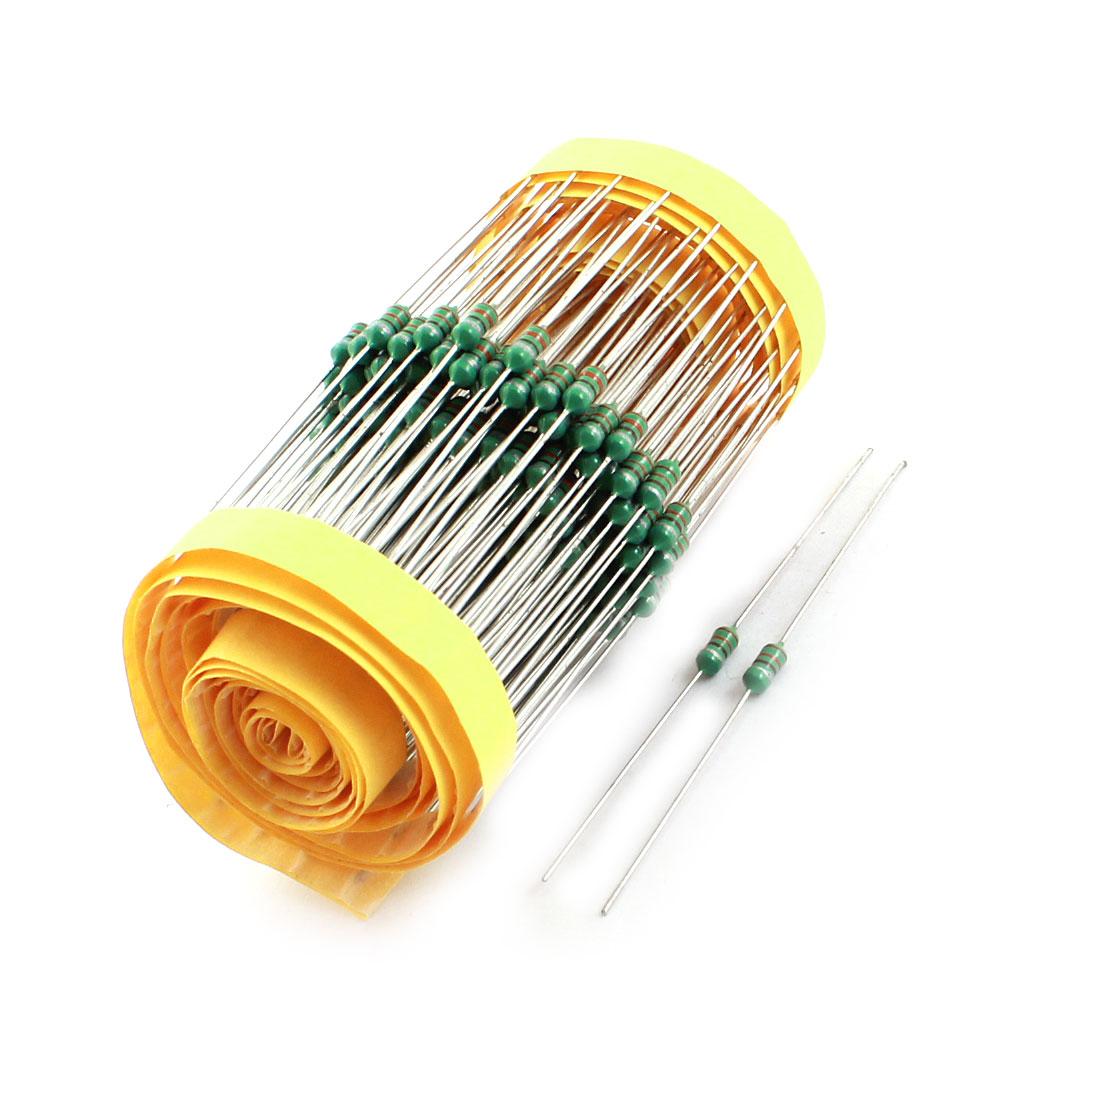 200Pcs PCB Board Parts 1/4W 330uH 10% Color Ring Inductors 0307 3x7mm